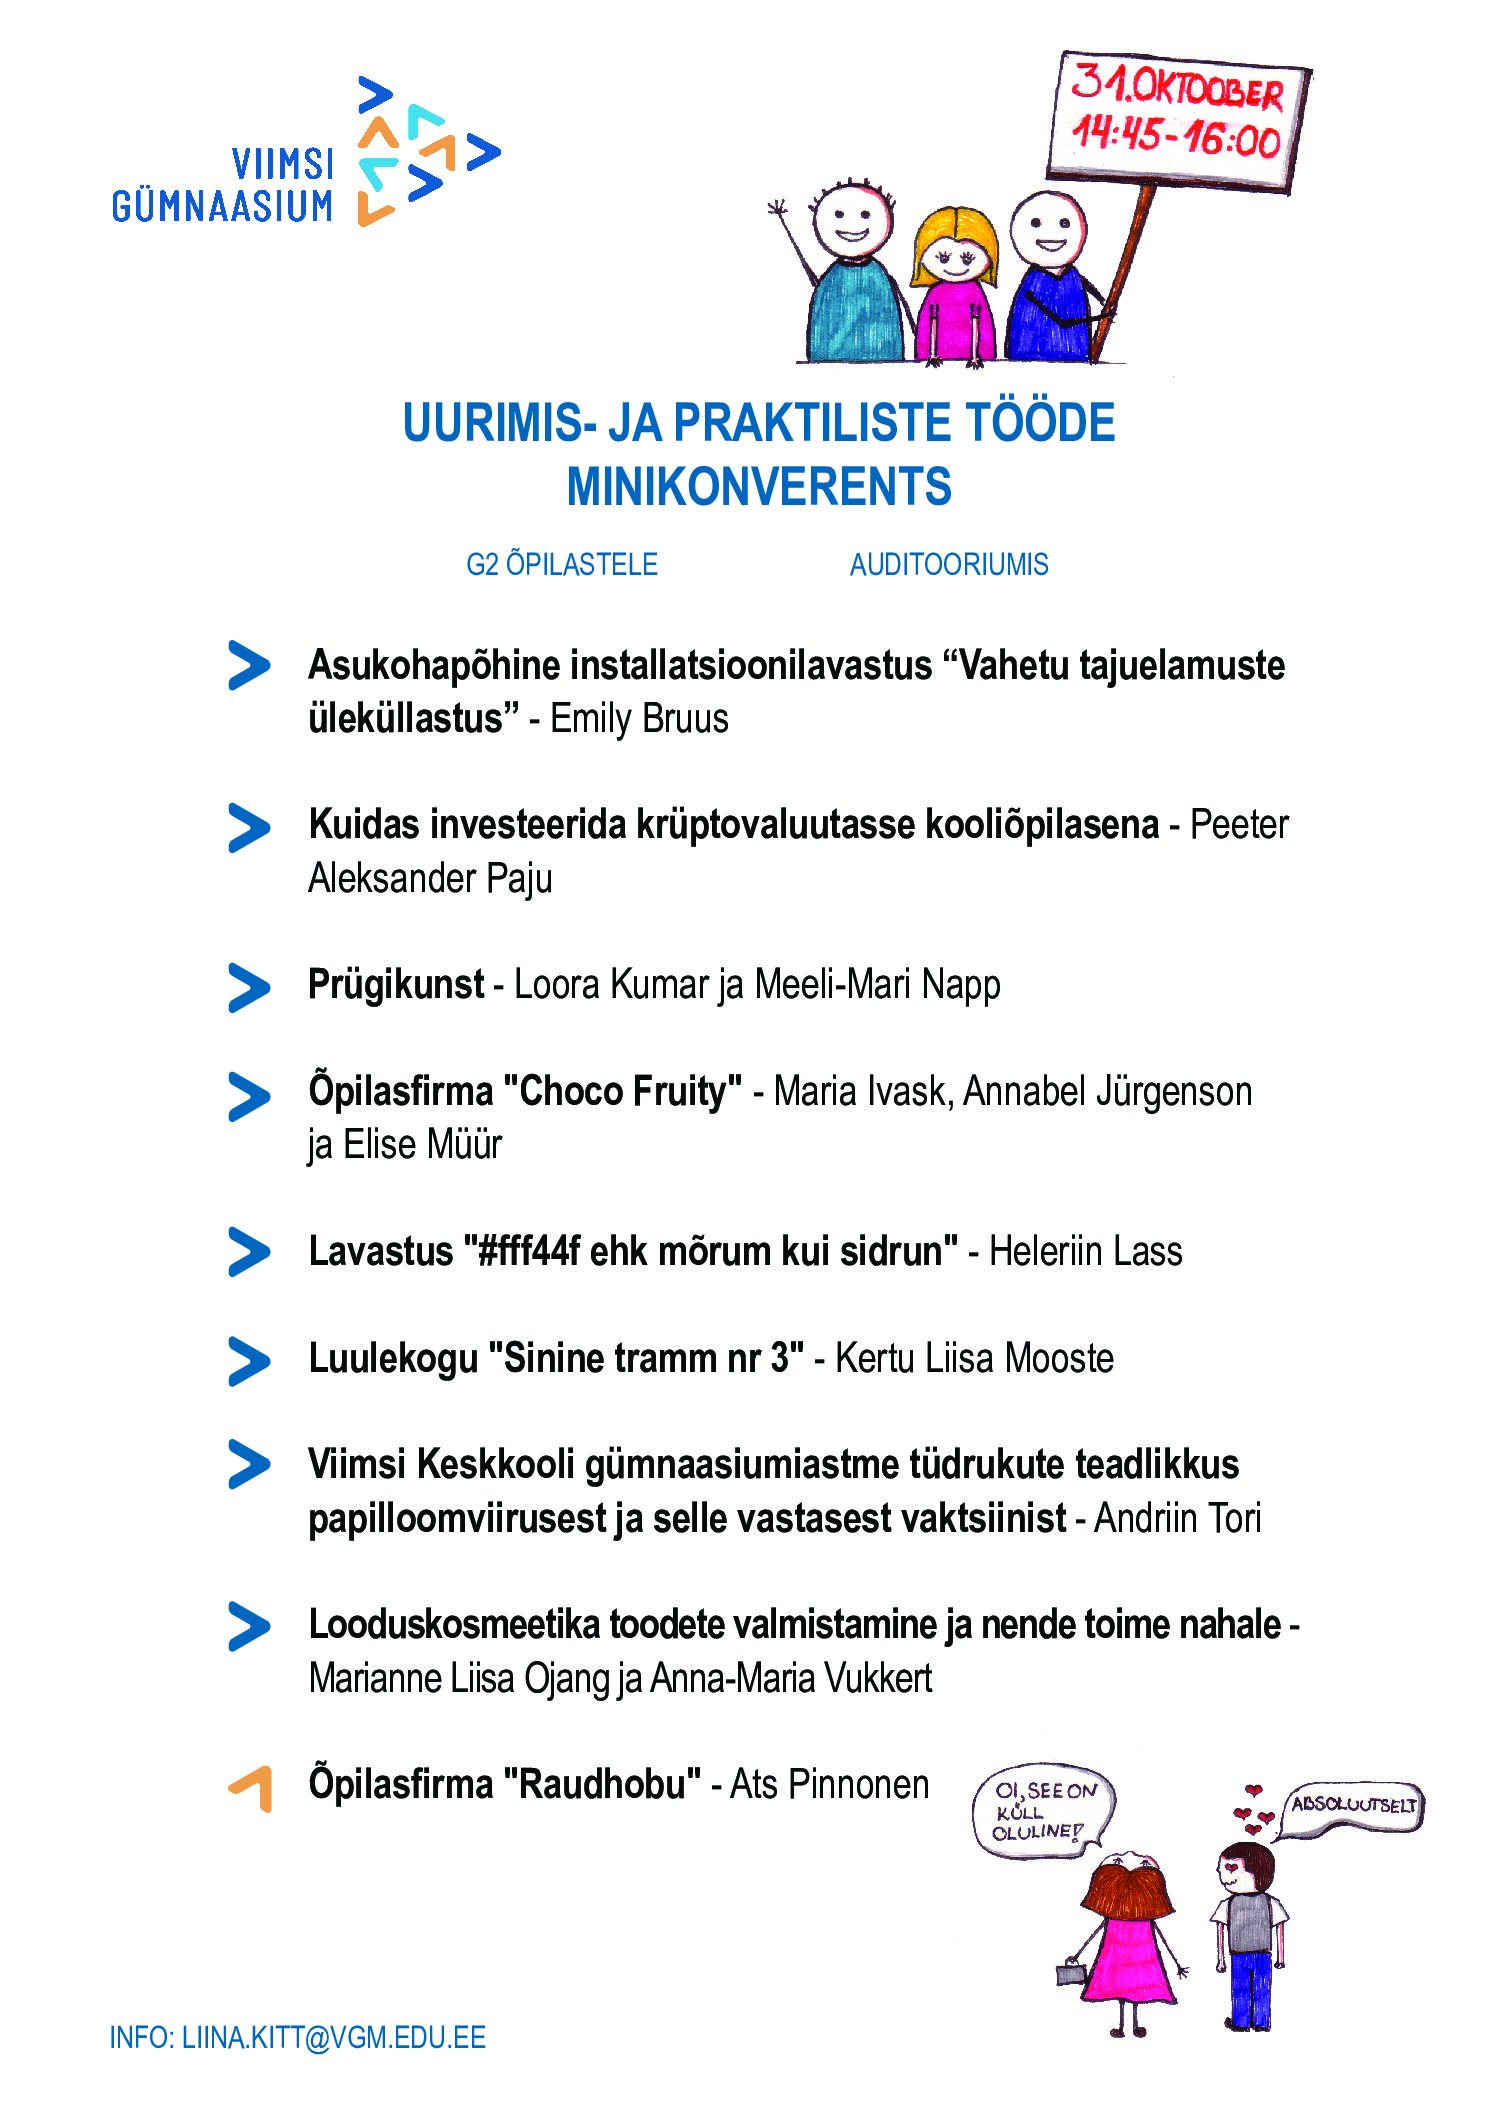 UPT minikonverents 31.10.2018